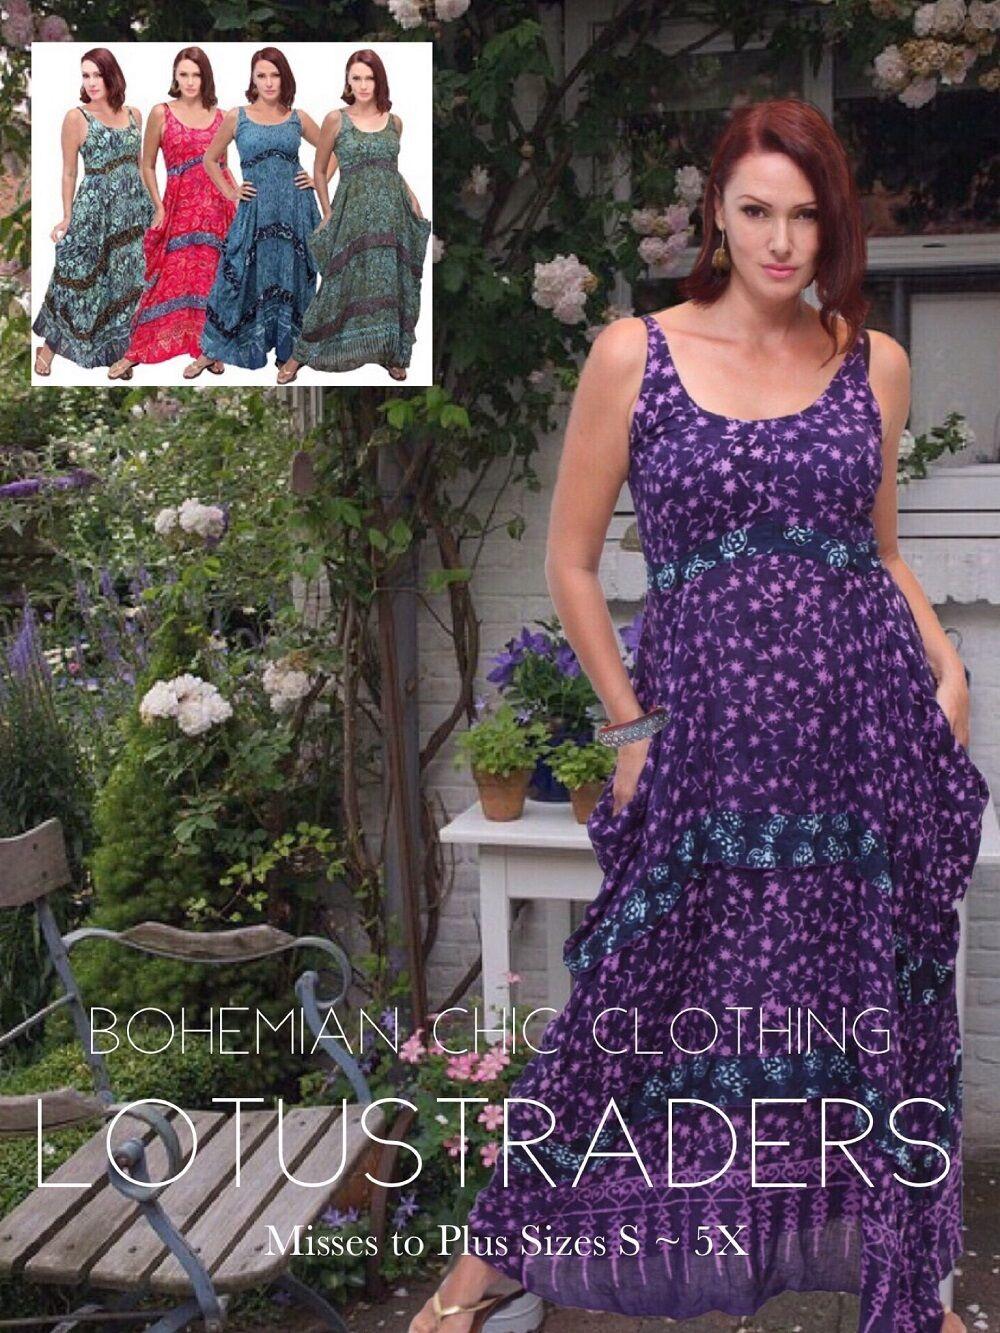 VINTAGE ROBE LONGUE-cravaters Art Gauzy Batik-Empire waistlinet 775 LOTUSTRADERS